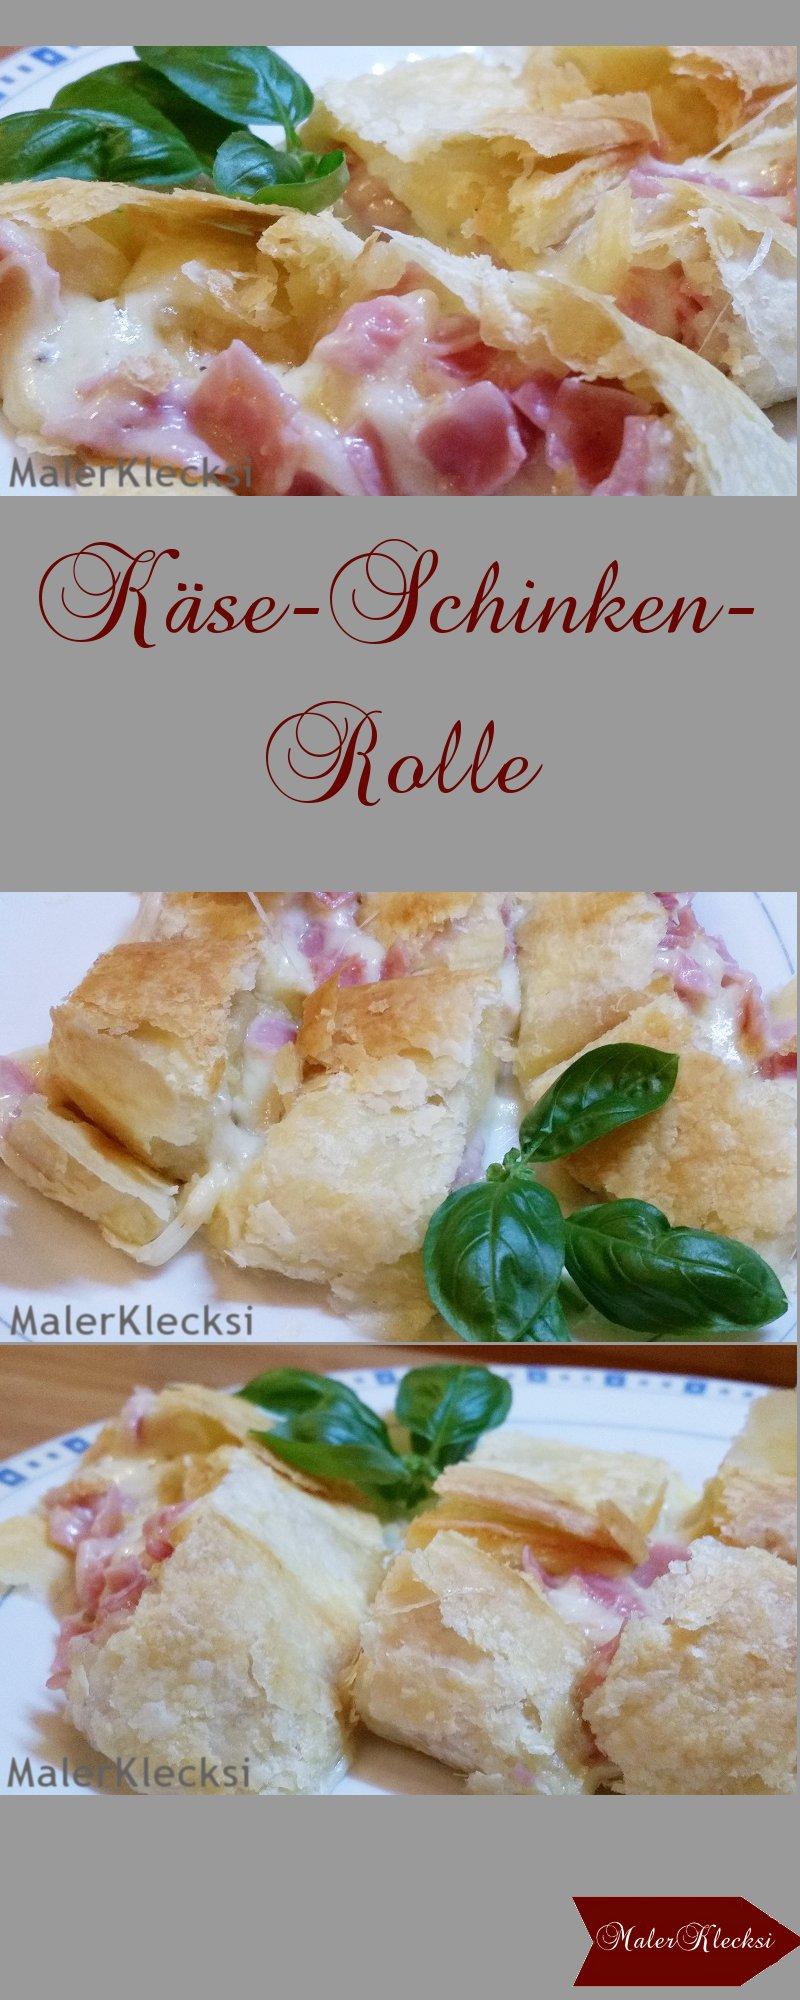 Käse-Schinken-Rolle